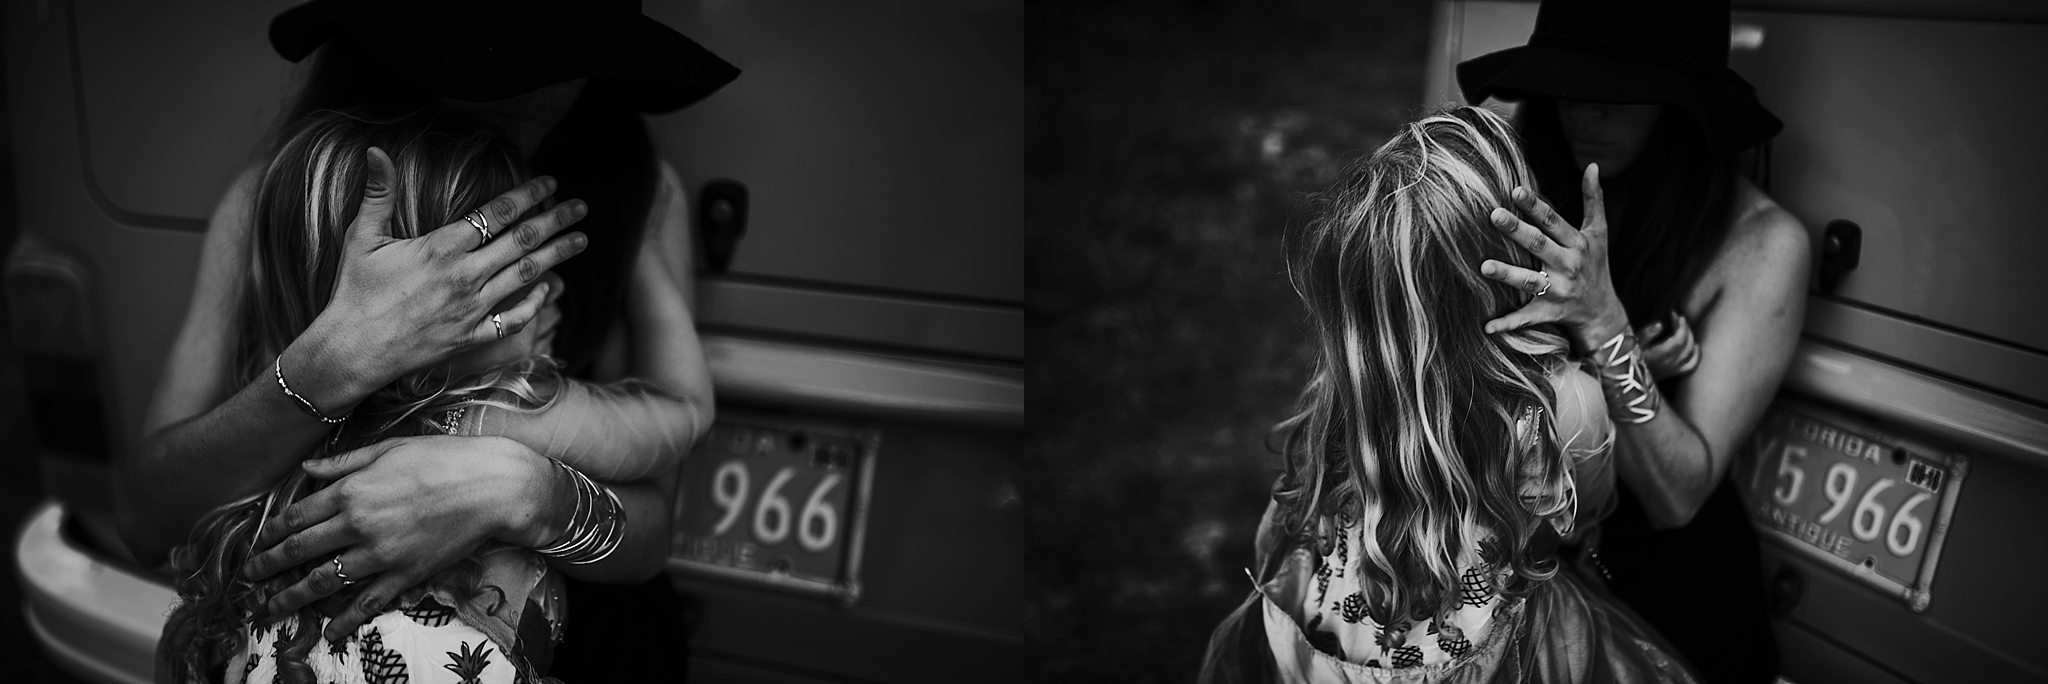 twyla jones photography - treasure coast - florida family photography riverbend park jupiter florida-6316.jpg